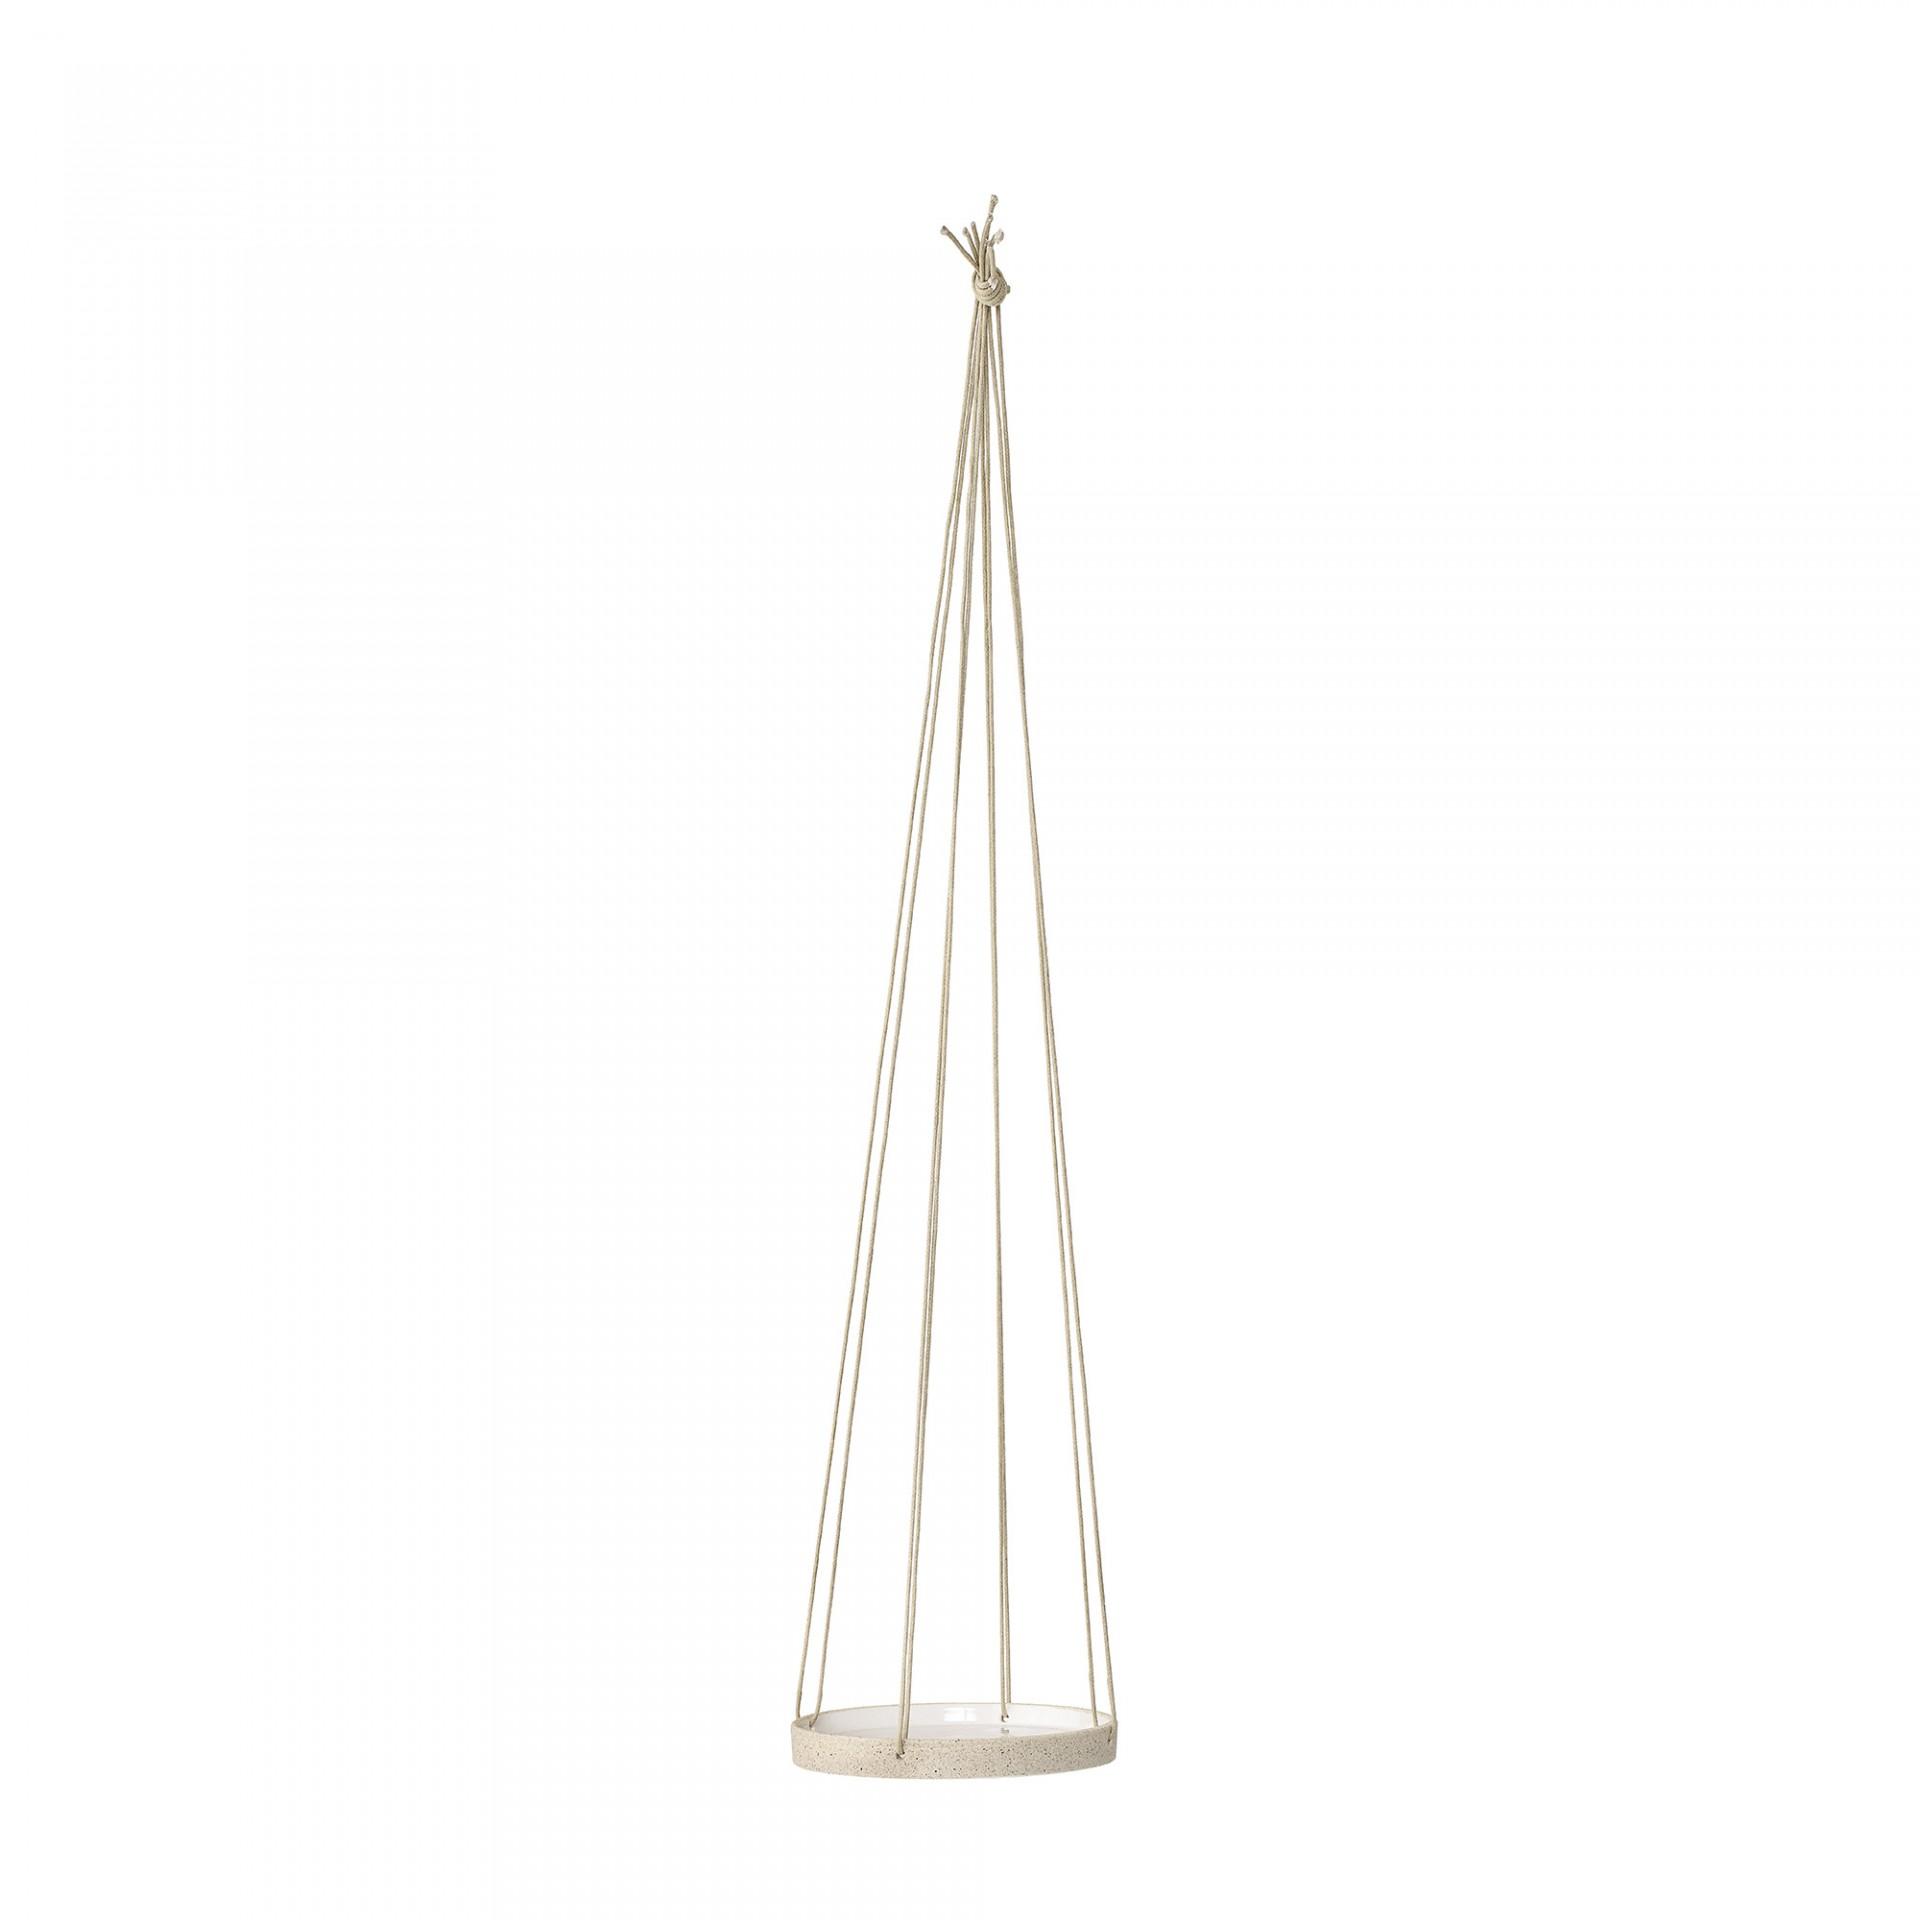 Suporte p/vaso, cerâmica, branco/bege, Ø16X80